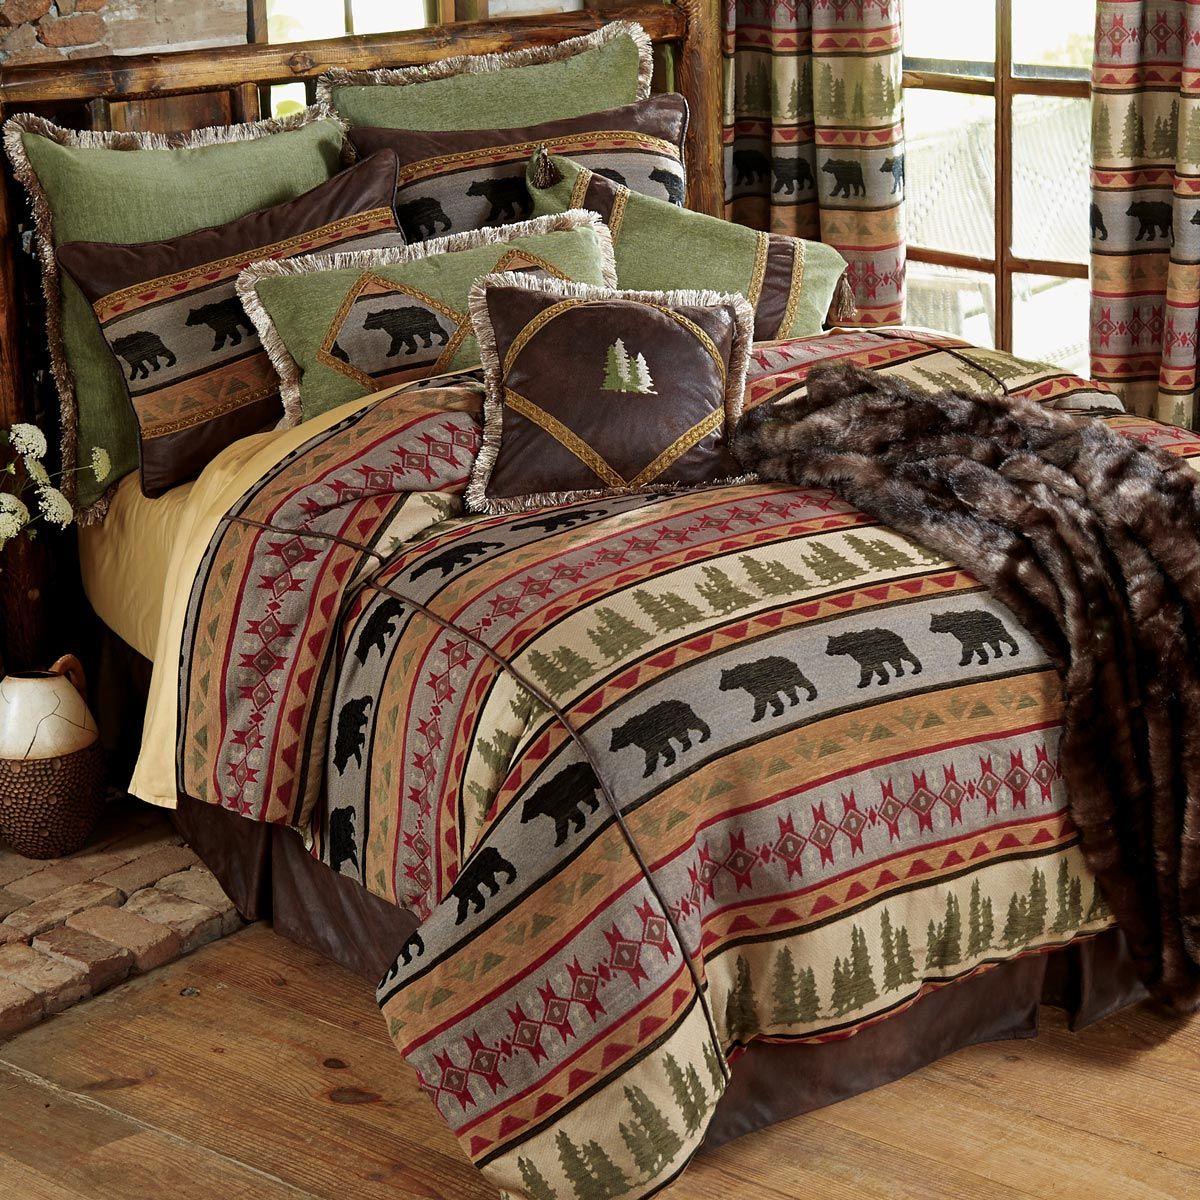 Montana Bear Bed Set King Cabin bedding sets, Cabin